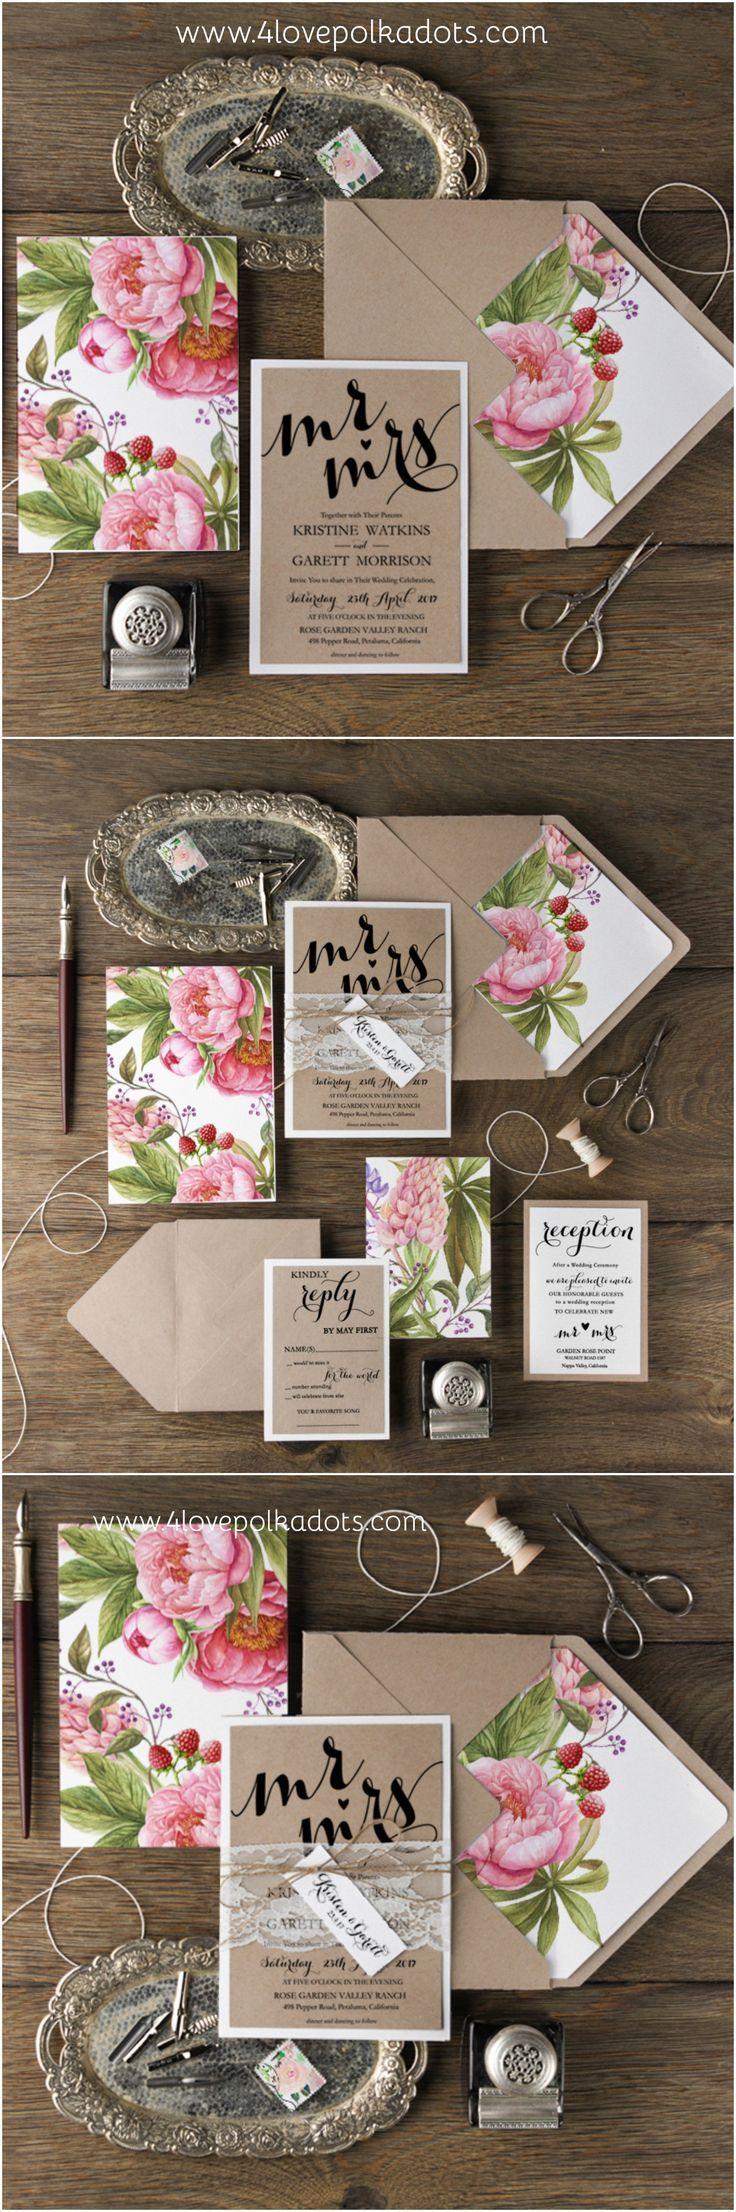 Summer wedding invitations 4lovepolkadots weddinginvitations peonywedding